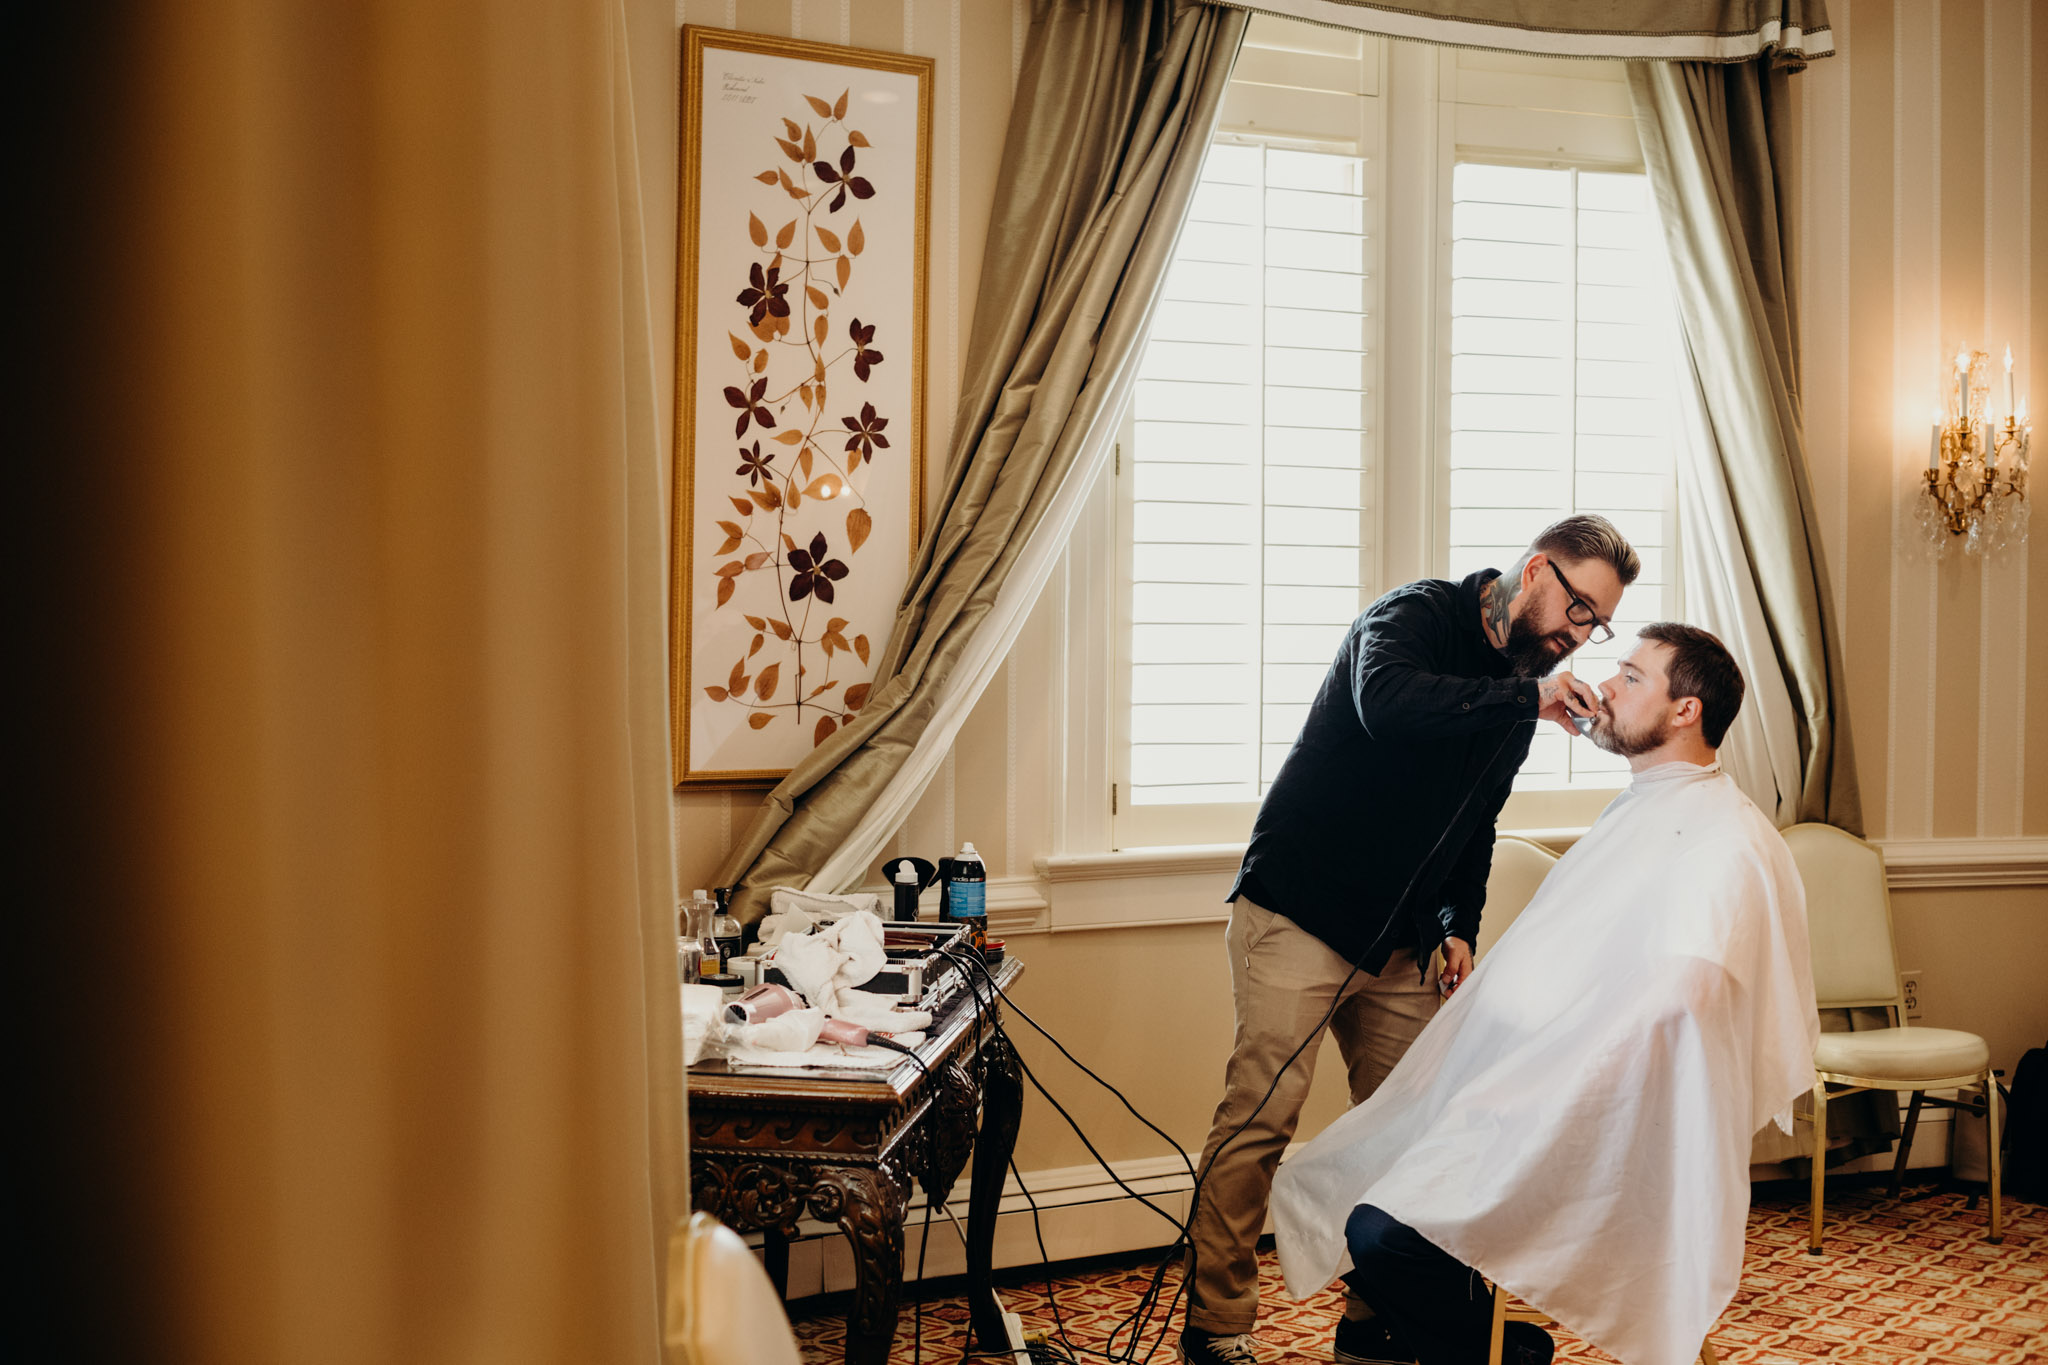 Country Club of Virginia Wedding Photographer_0006.jpg